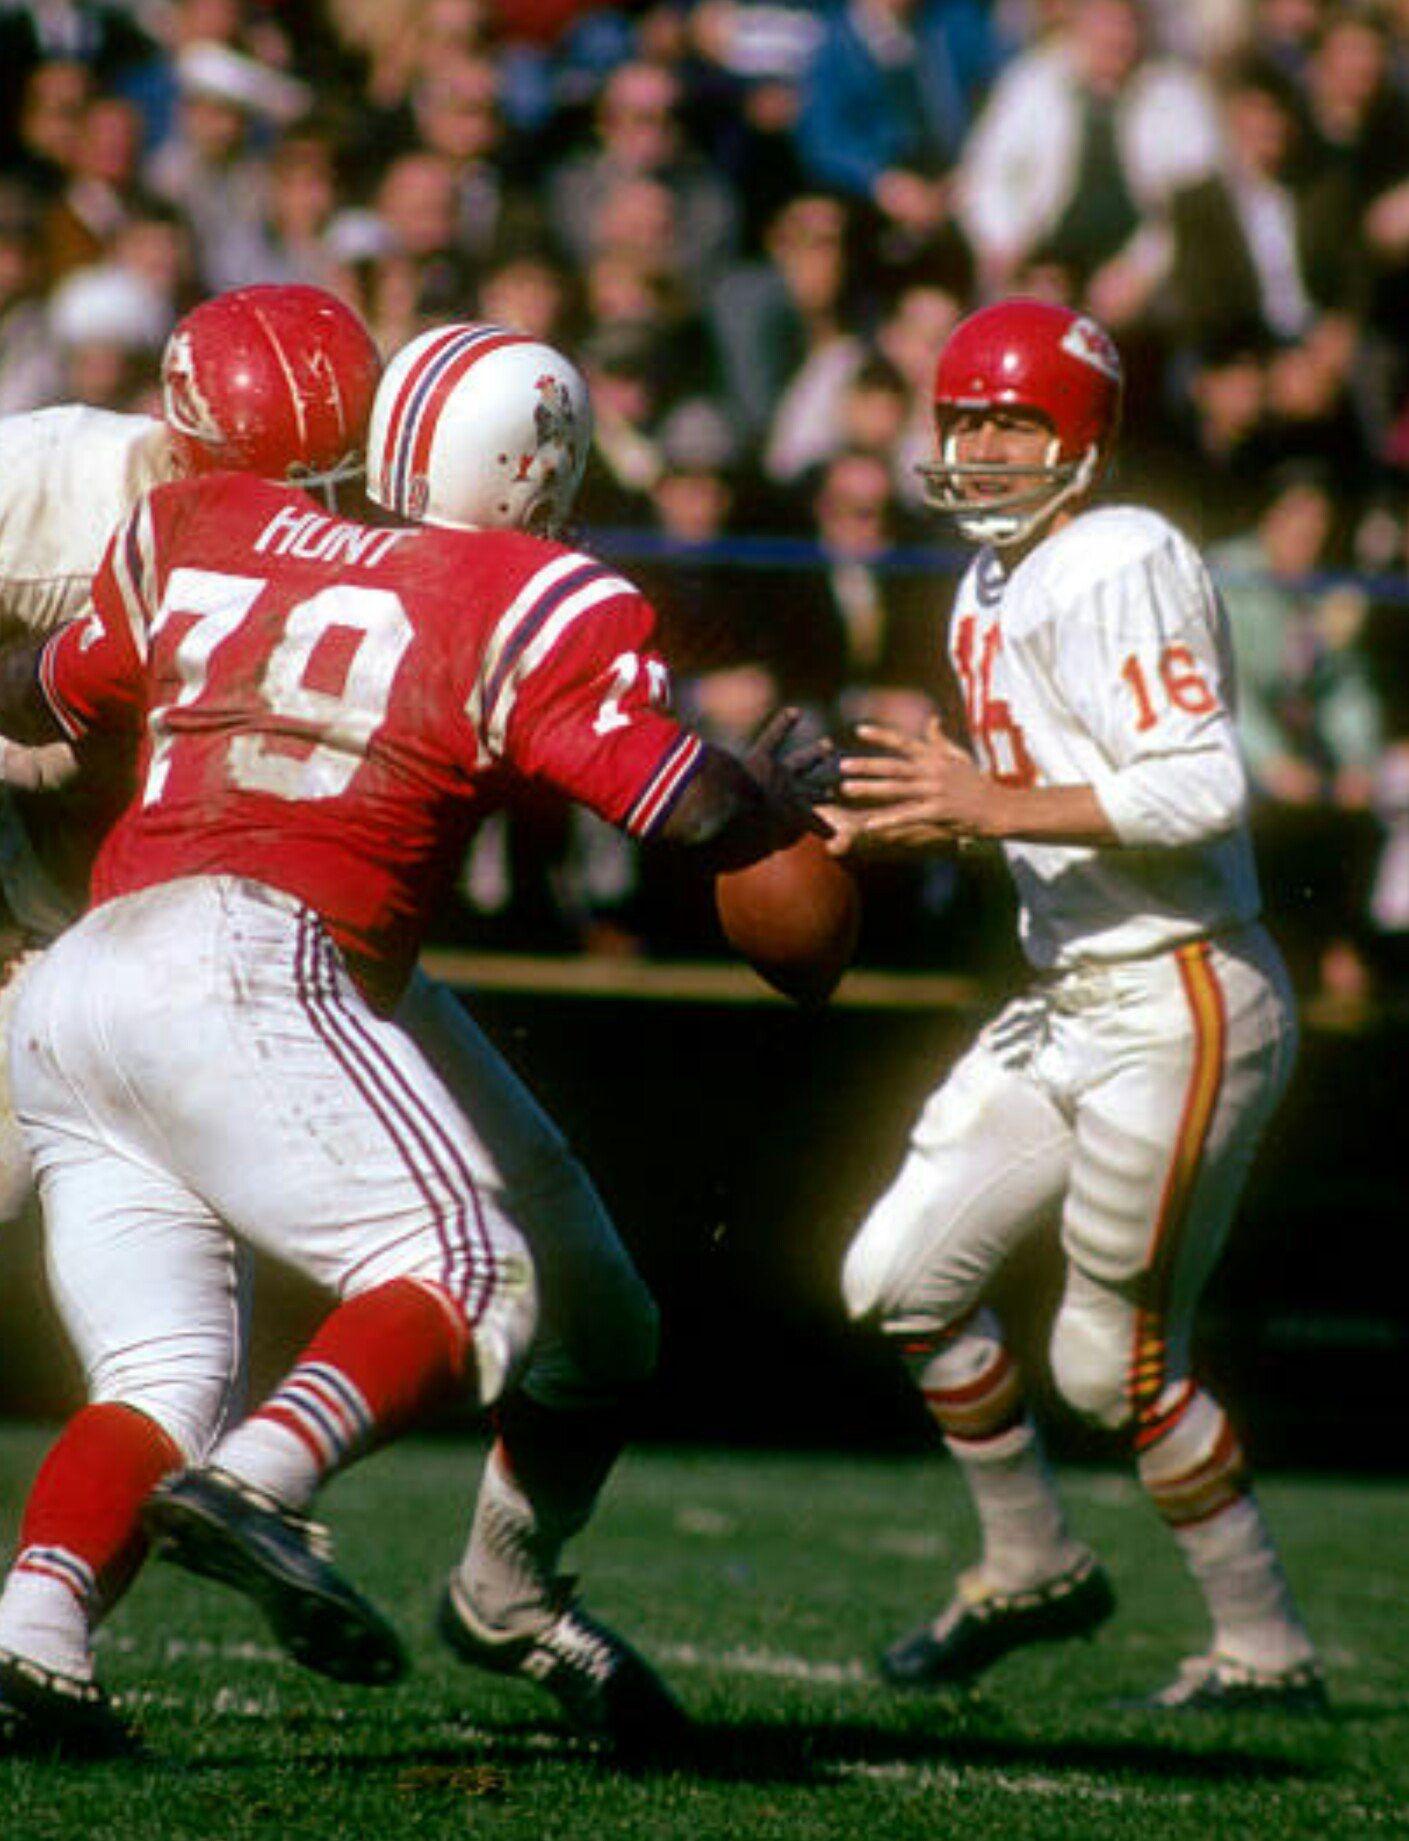 Pin By Joe On Vintage New England Patriots American Football League Kansas City Chiefs Football Chiefs Football